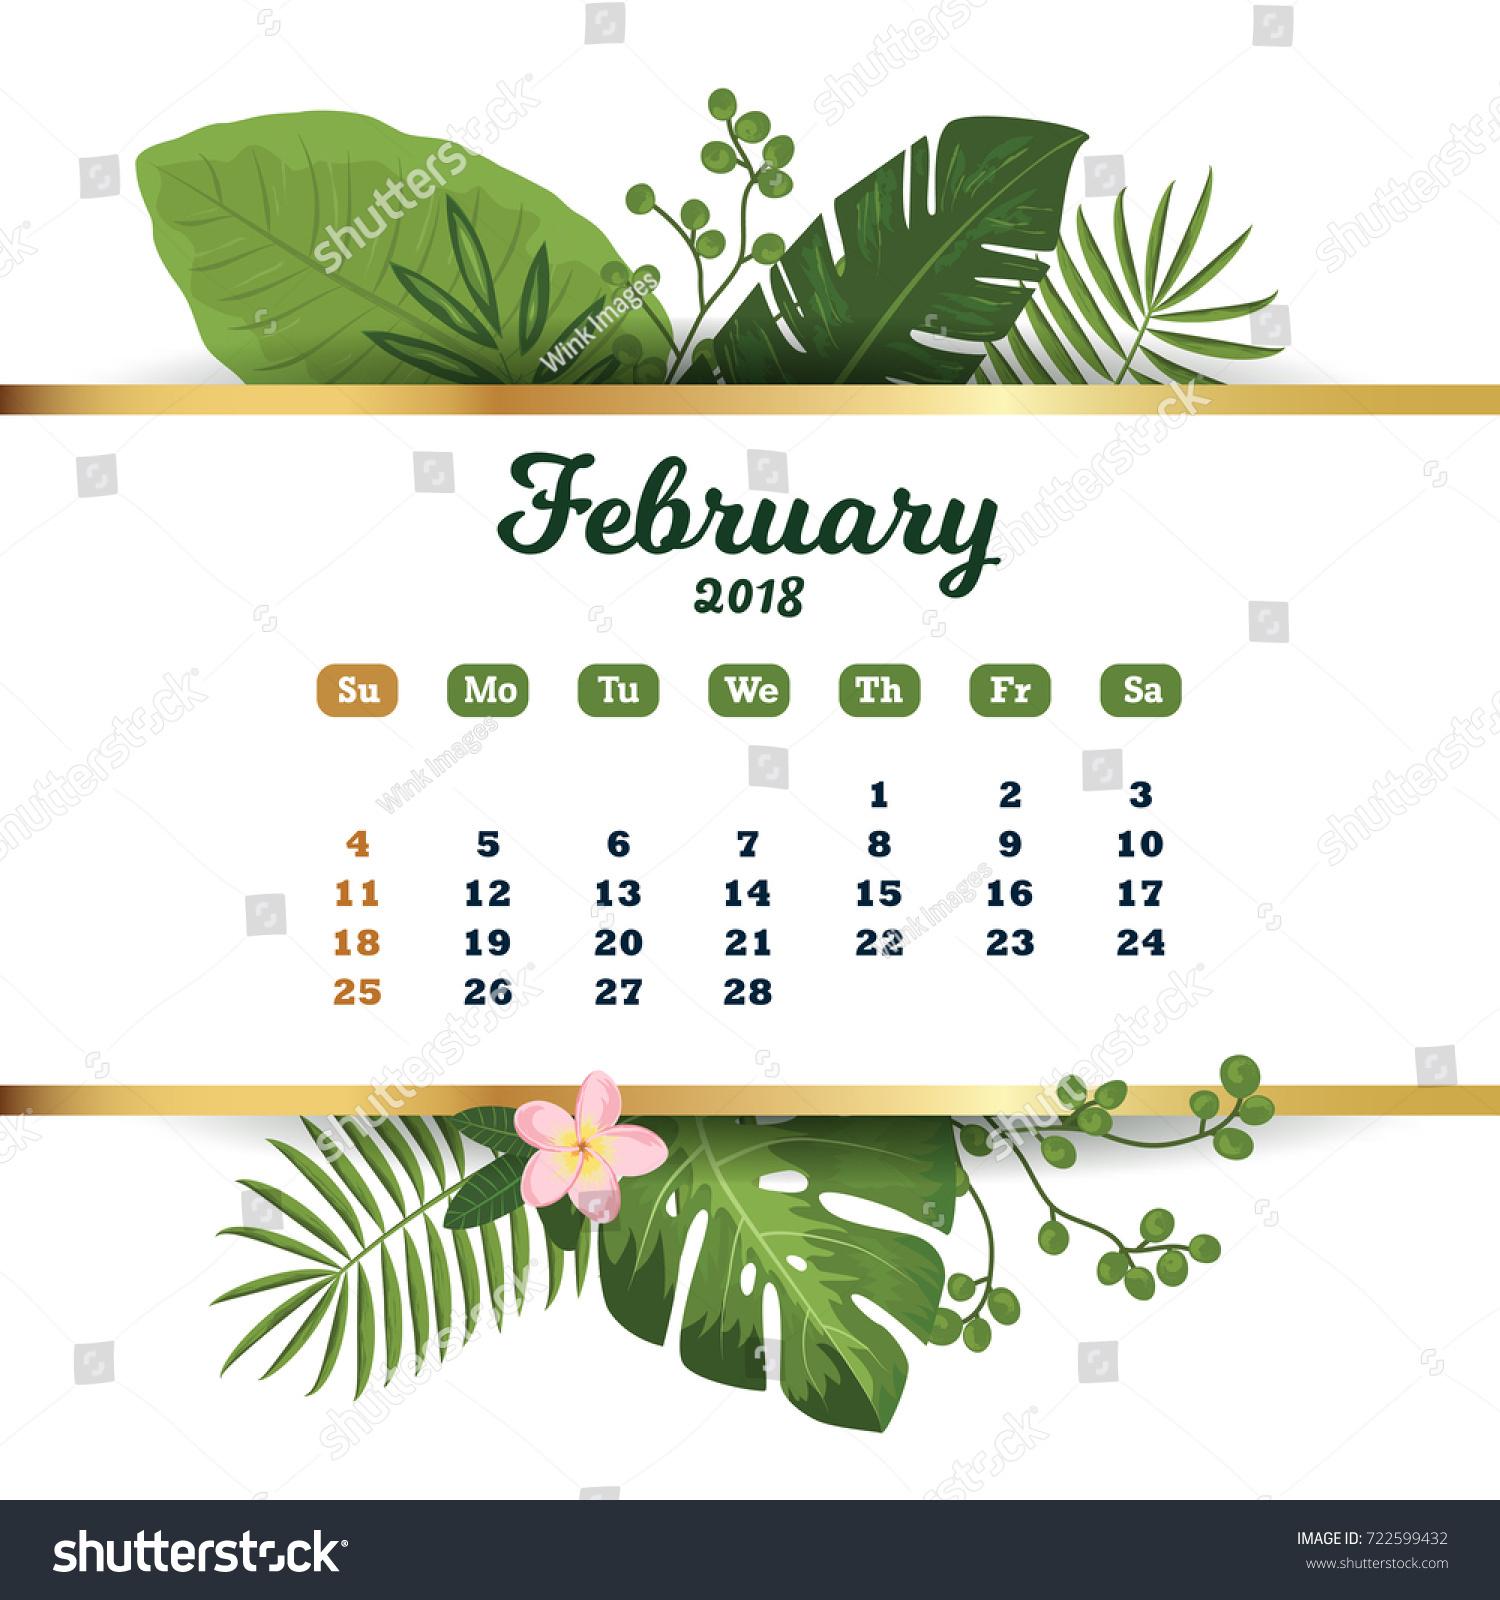 February 2018 Tropical Printable Calendar 2018 Stock Vector ...